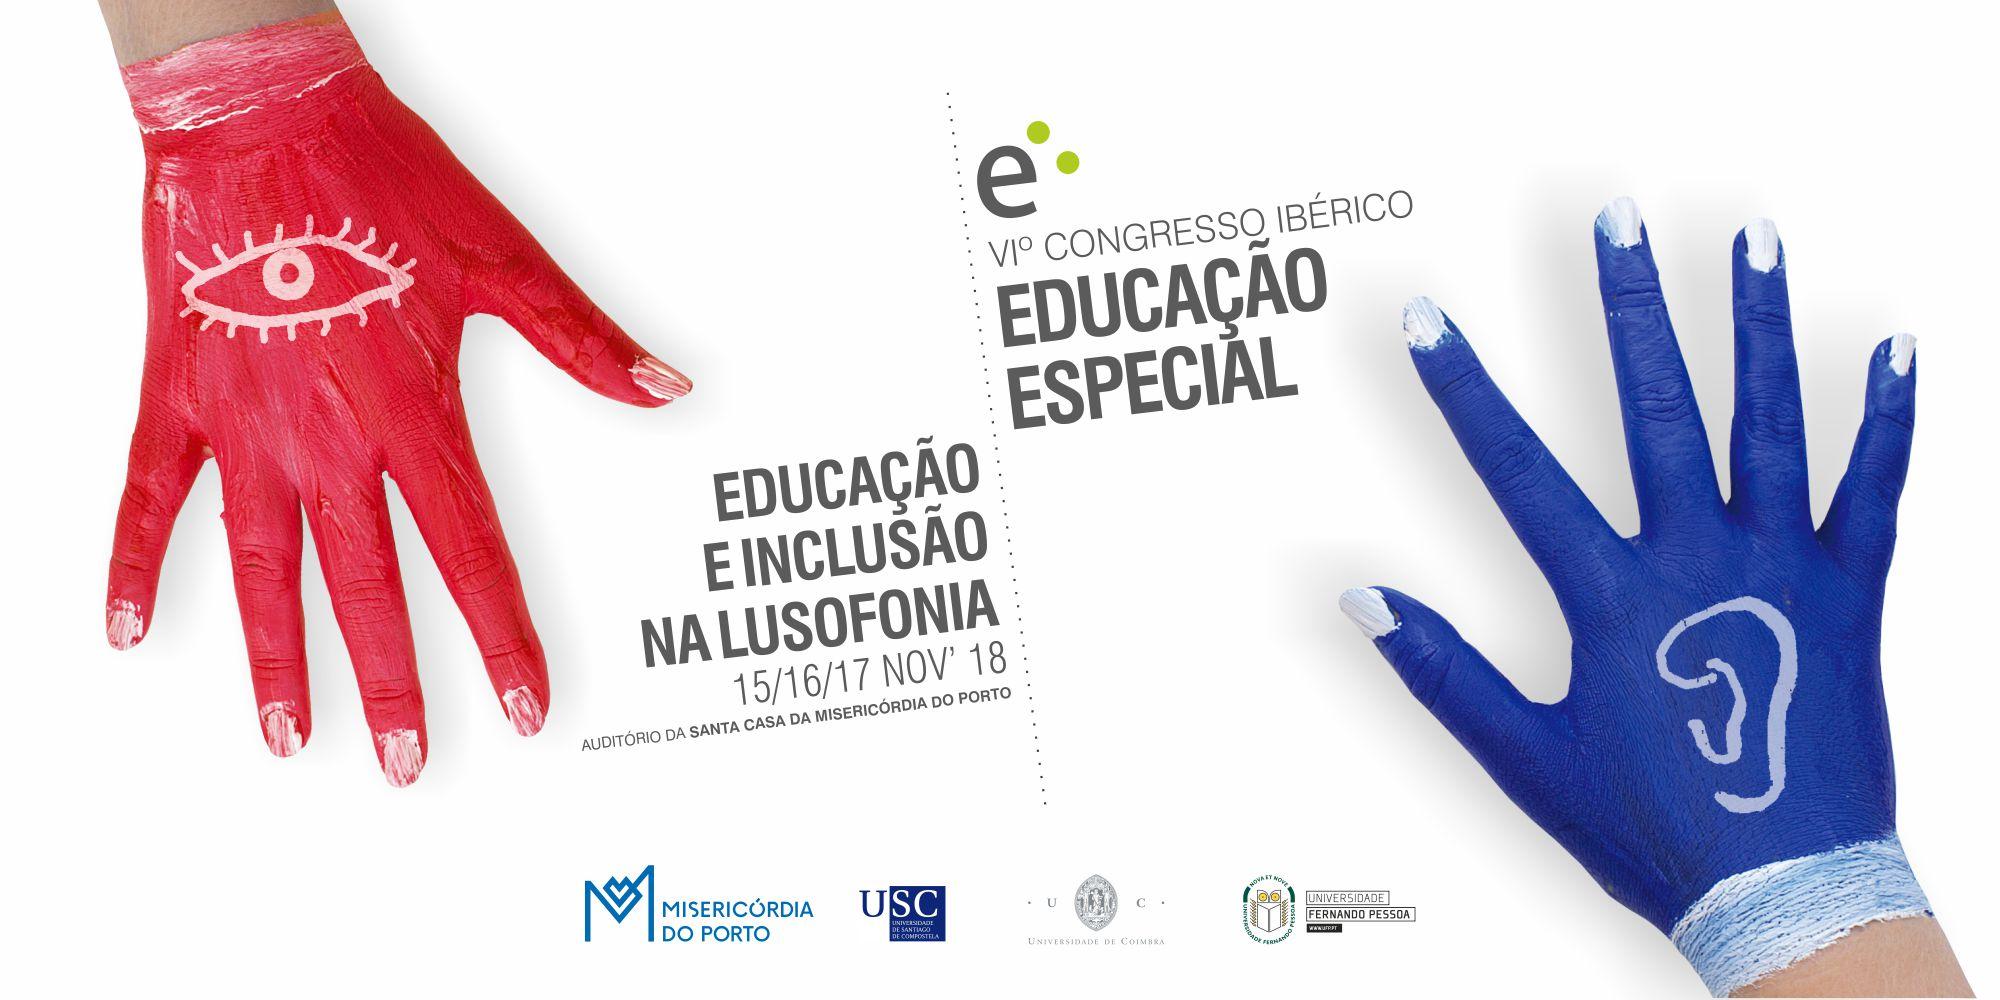 https://www.scmp.pt/assets/misc/img/Congressos/VI%20Congresso%20Ib%C3%A9rico%20Ed.Esp./banner_VI_congresso_educacaoespecial.jpg